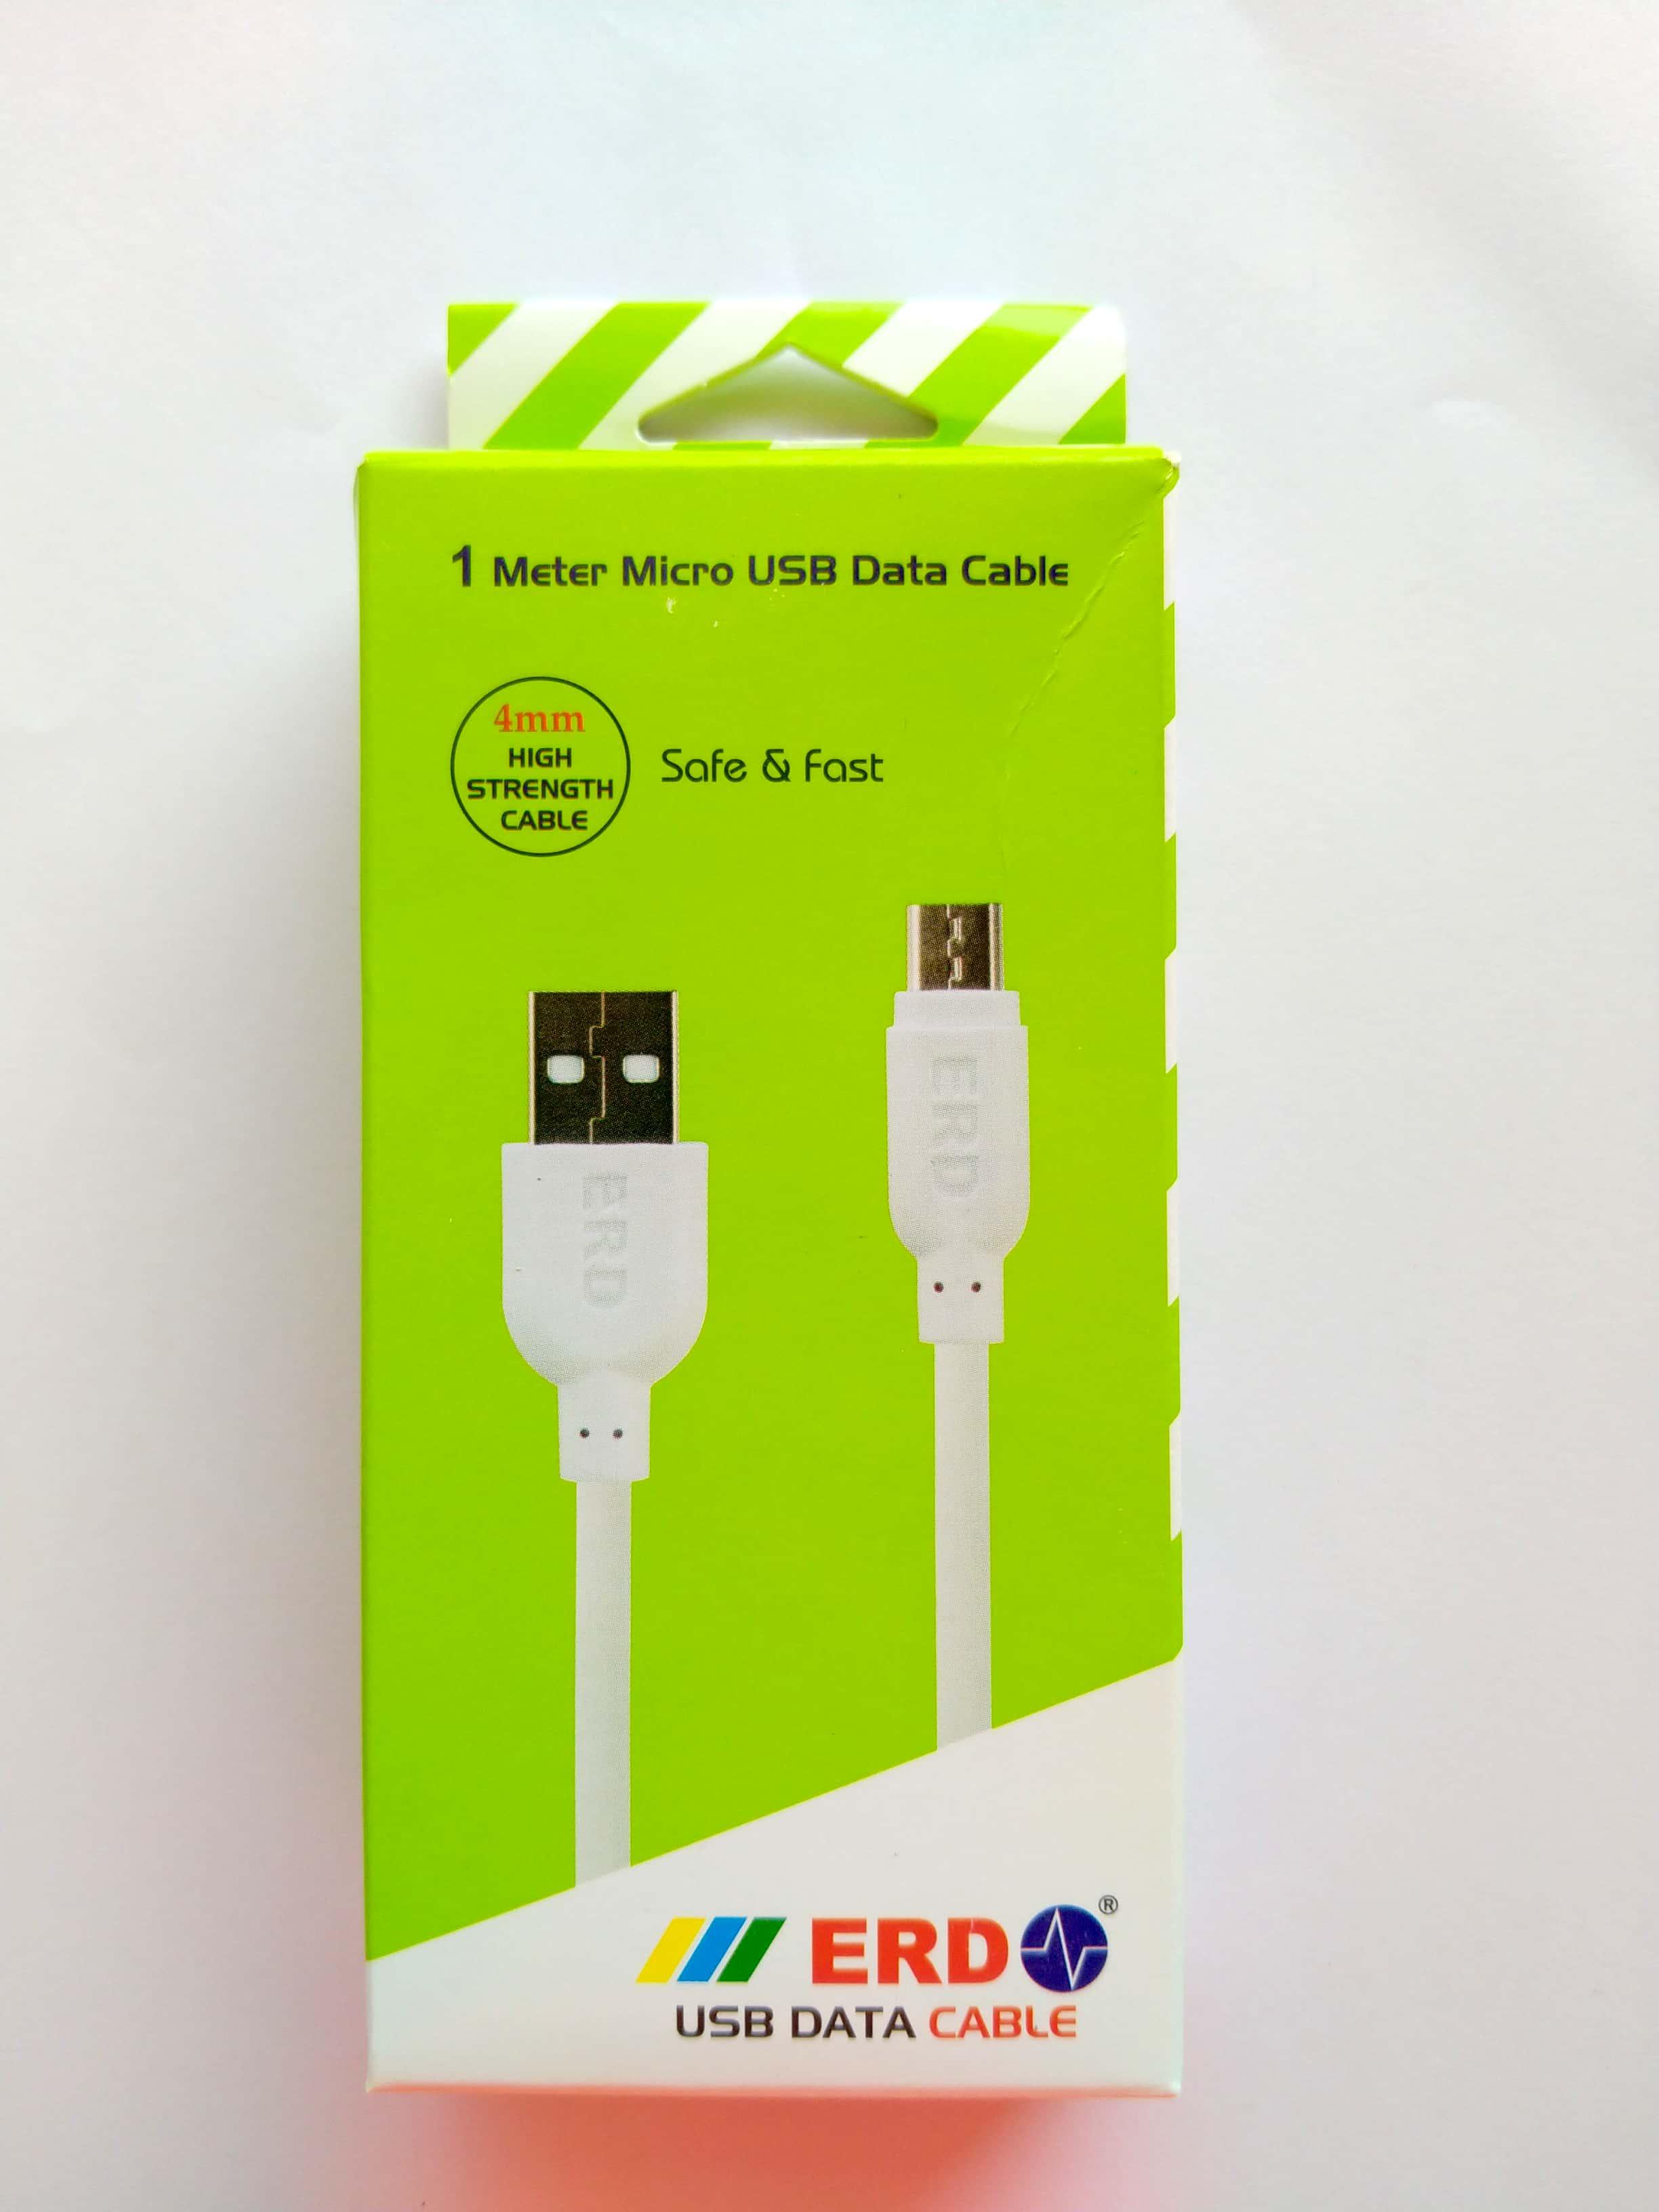 ERD 1 METER MICRO USB DATA CABLE